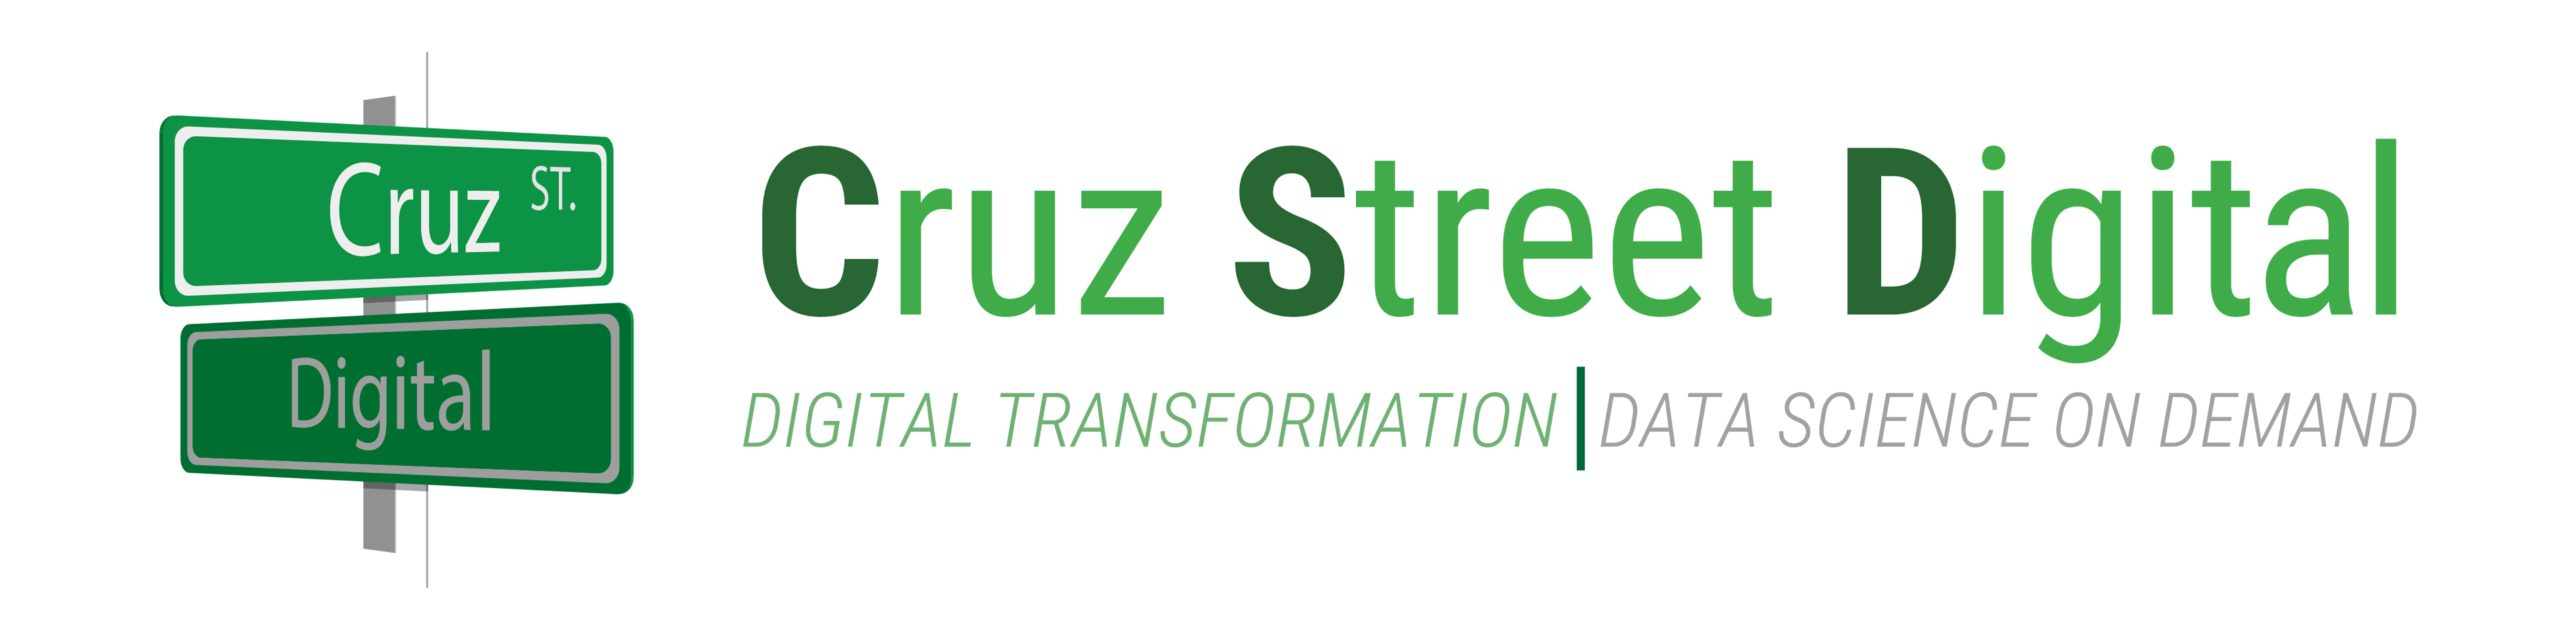 green font of cruz street digital logo